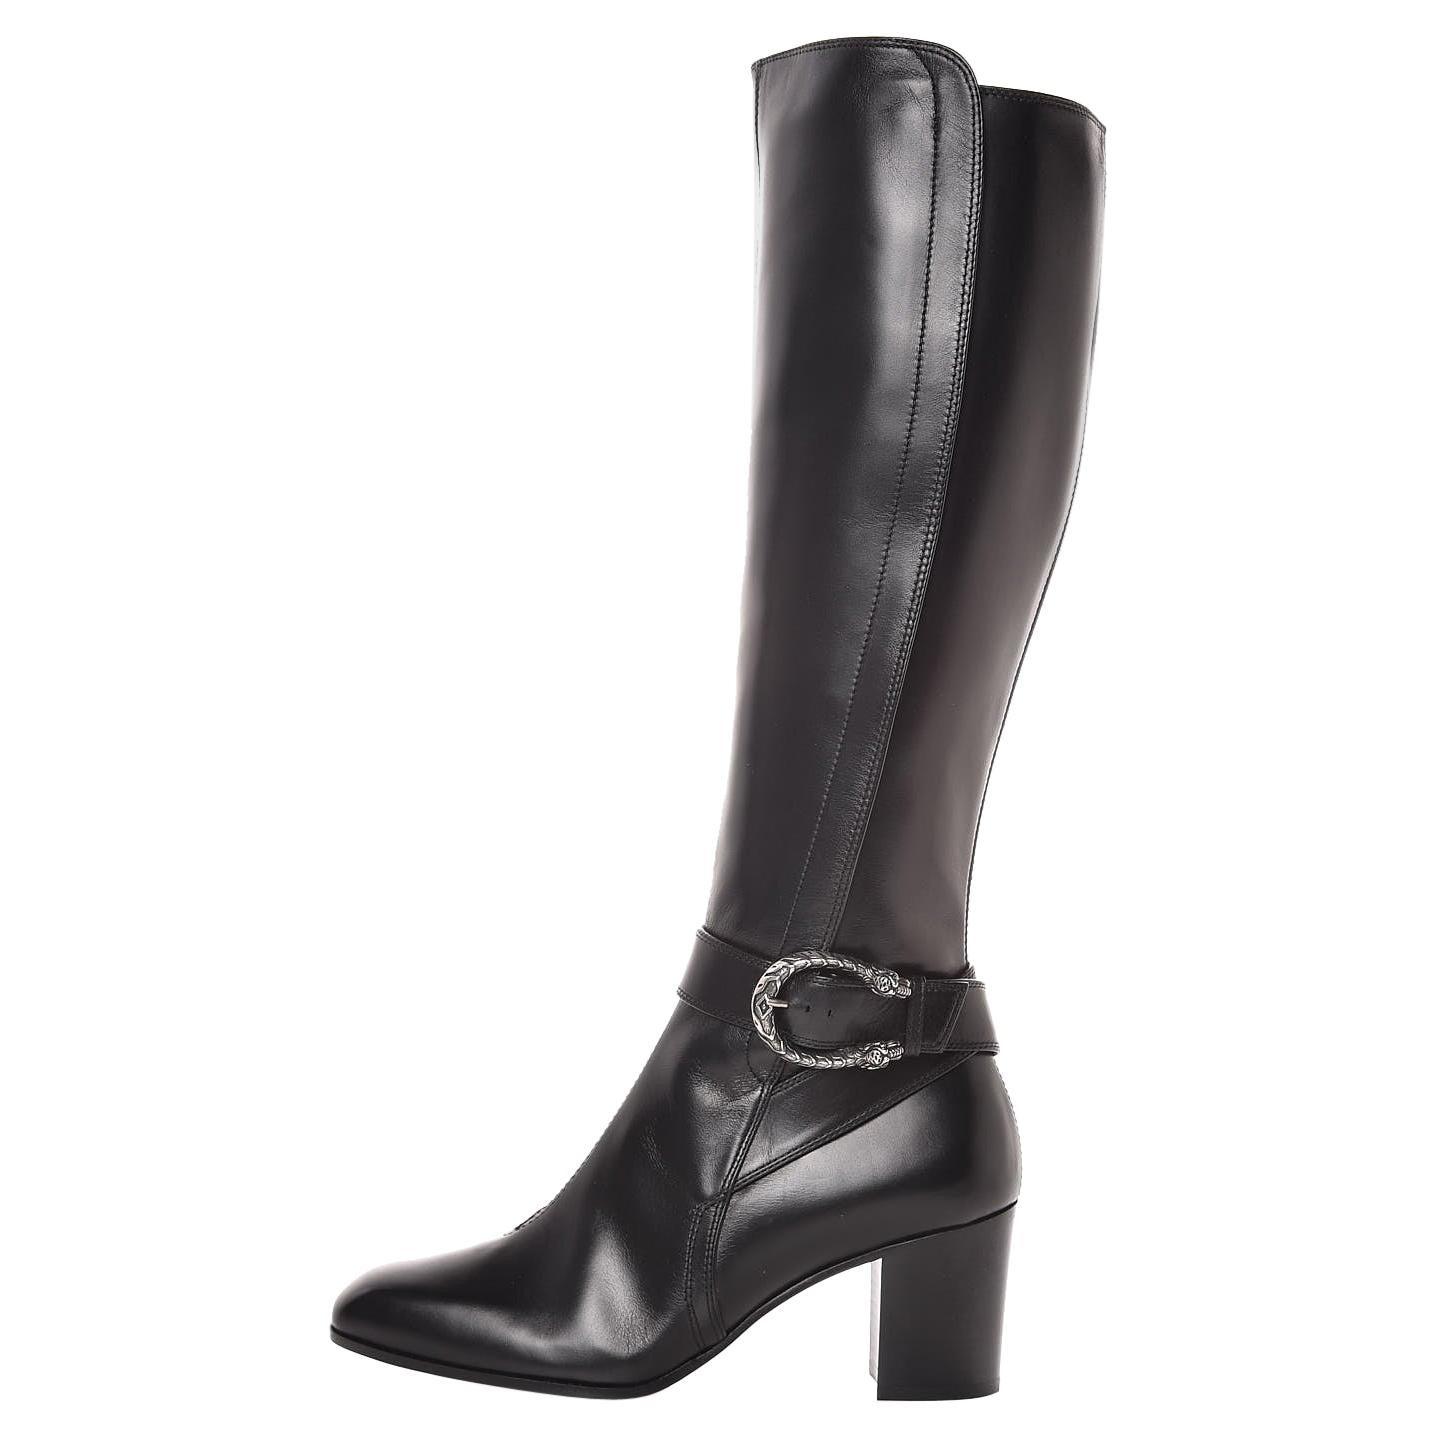 New GUCCI Calfskin Dionysus Knee High Boots 36